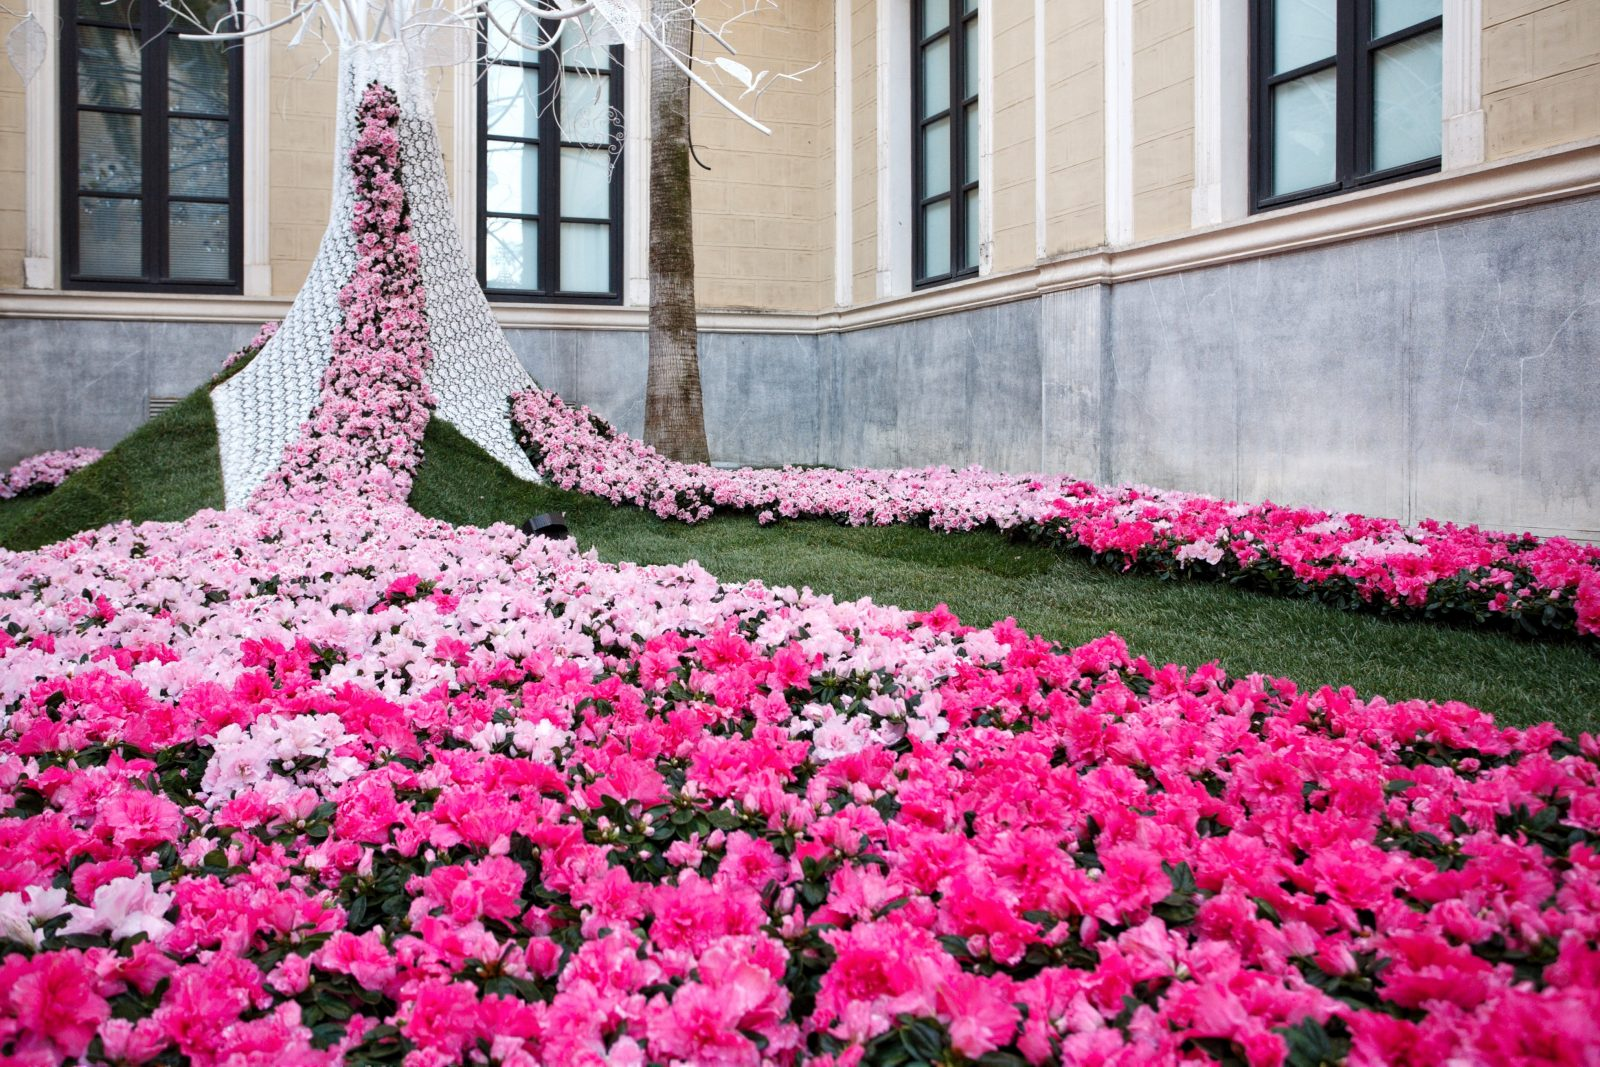 FLORA. Festival Internacional de las flores en Córdoba